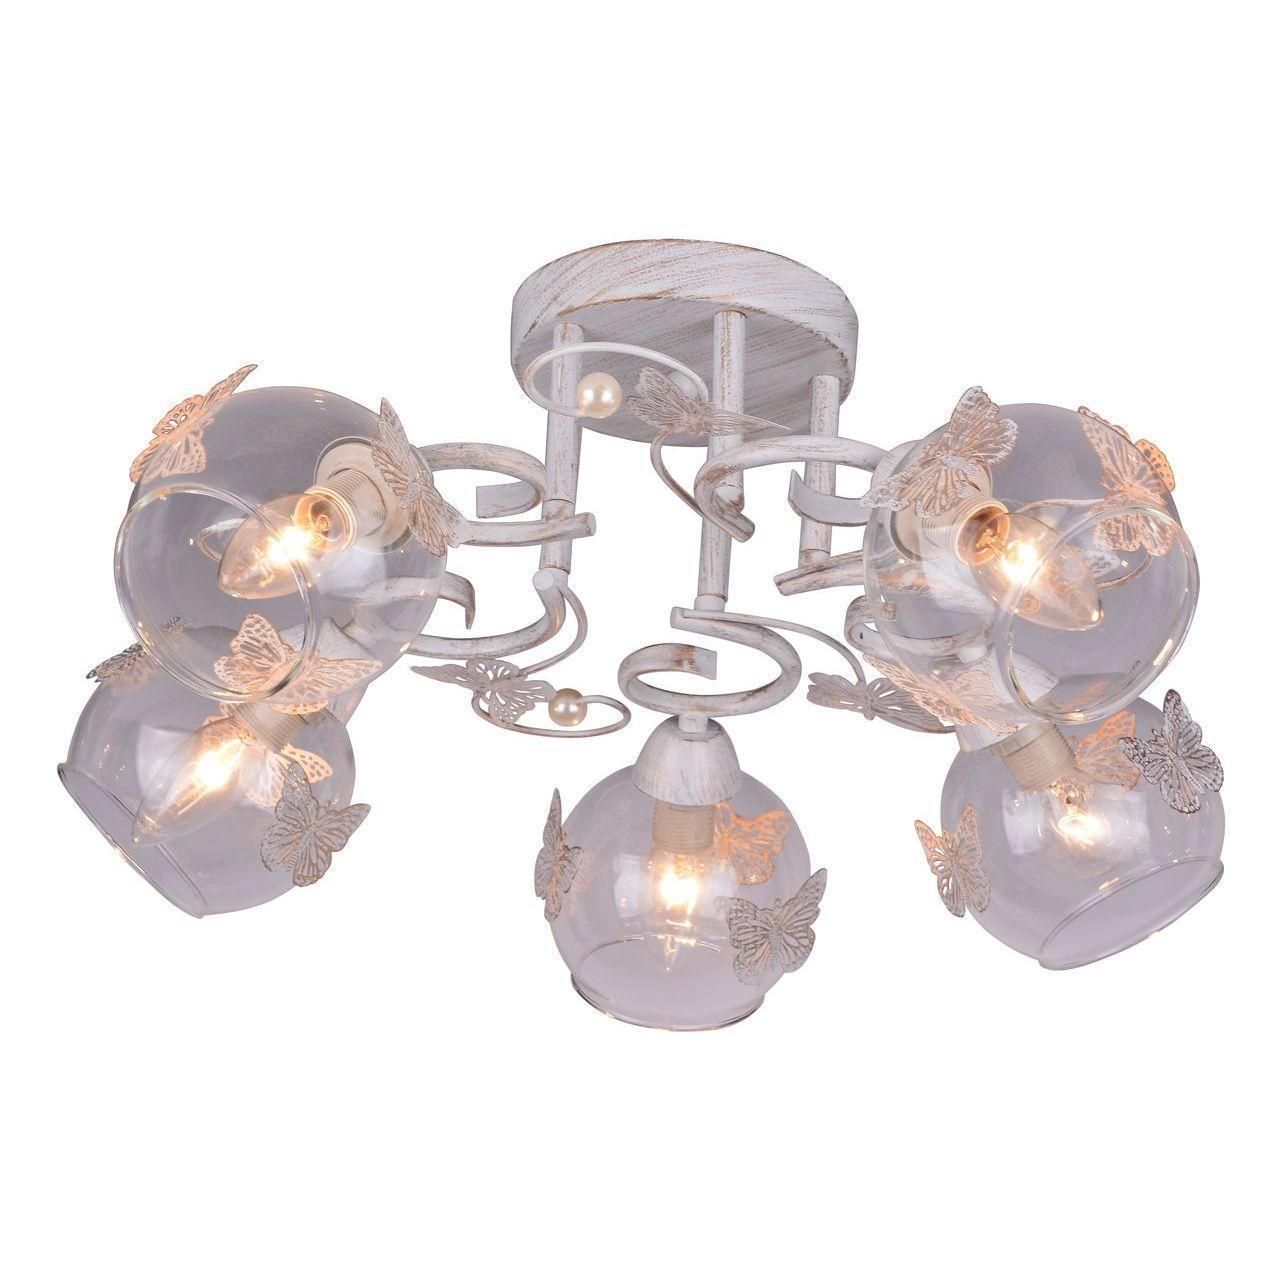 Люстра Arte Lamp Alessandra A5004PL-5WG потолочная arte lamp потолочная люстра arte lamp alessandra a5004pl 8ab